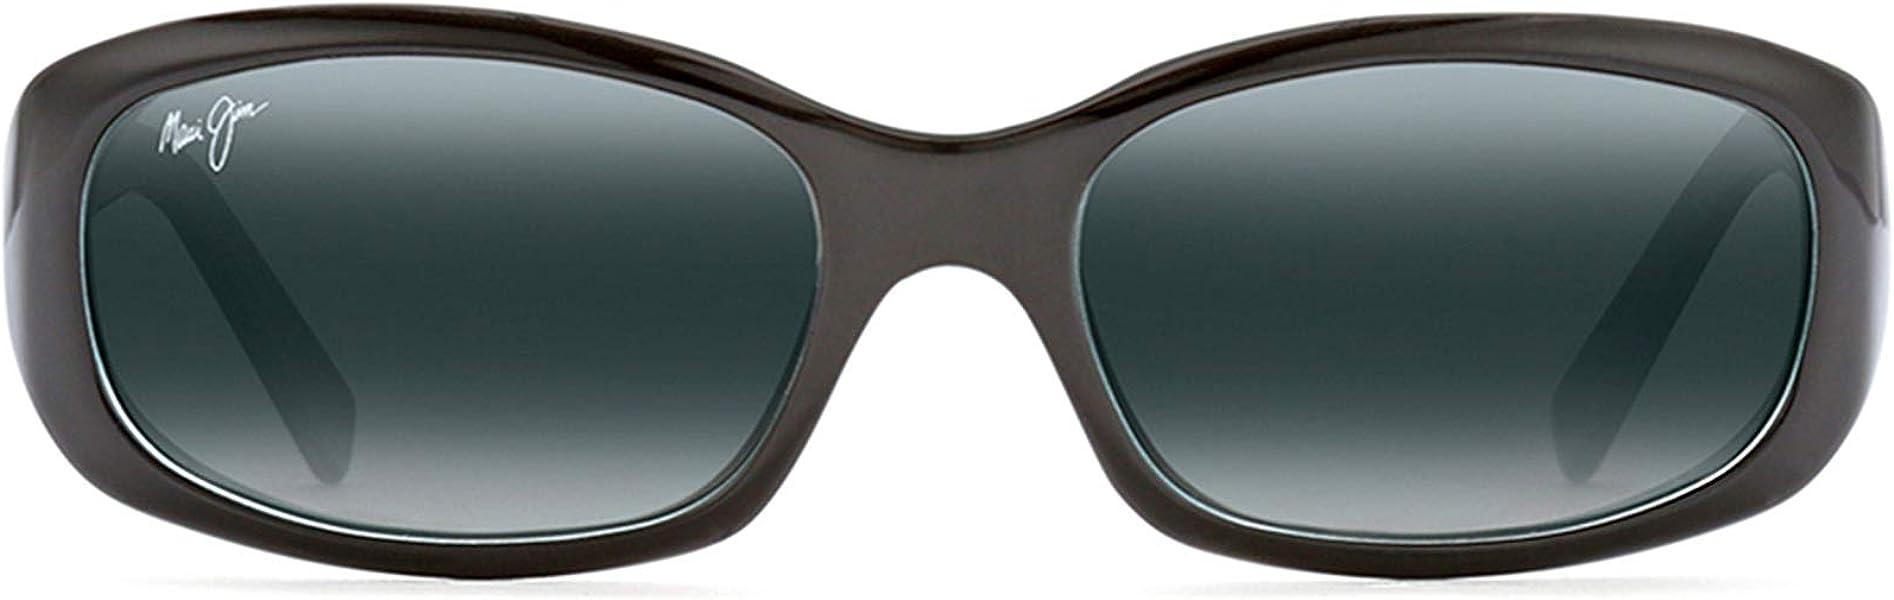 f61f1180e166 Amazon.com: Maui Jim Sunglasses | Women's | Punchbowl 219-03 | Black & Blue  Rectangular Frame, Polarized Neutral Grey Lenses, with Patented  PolarizedPlus2 ...